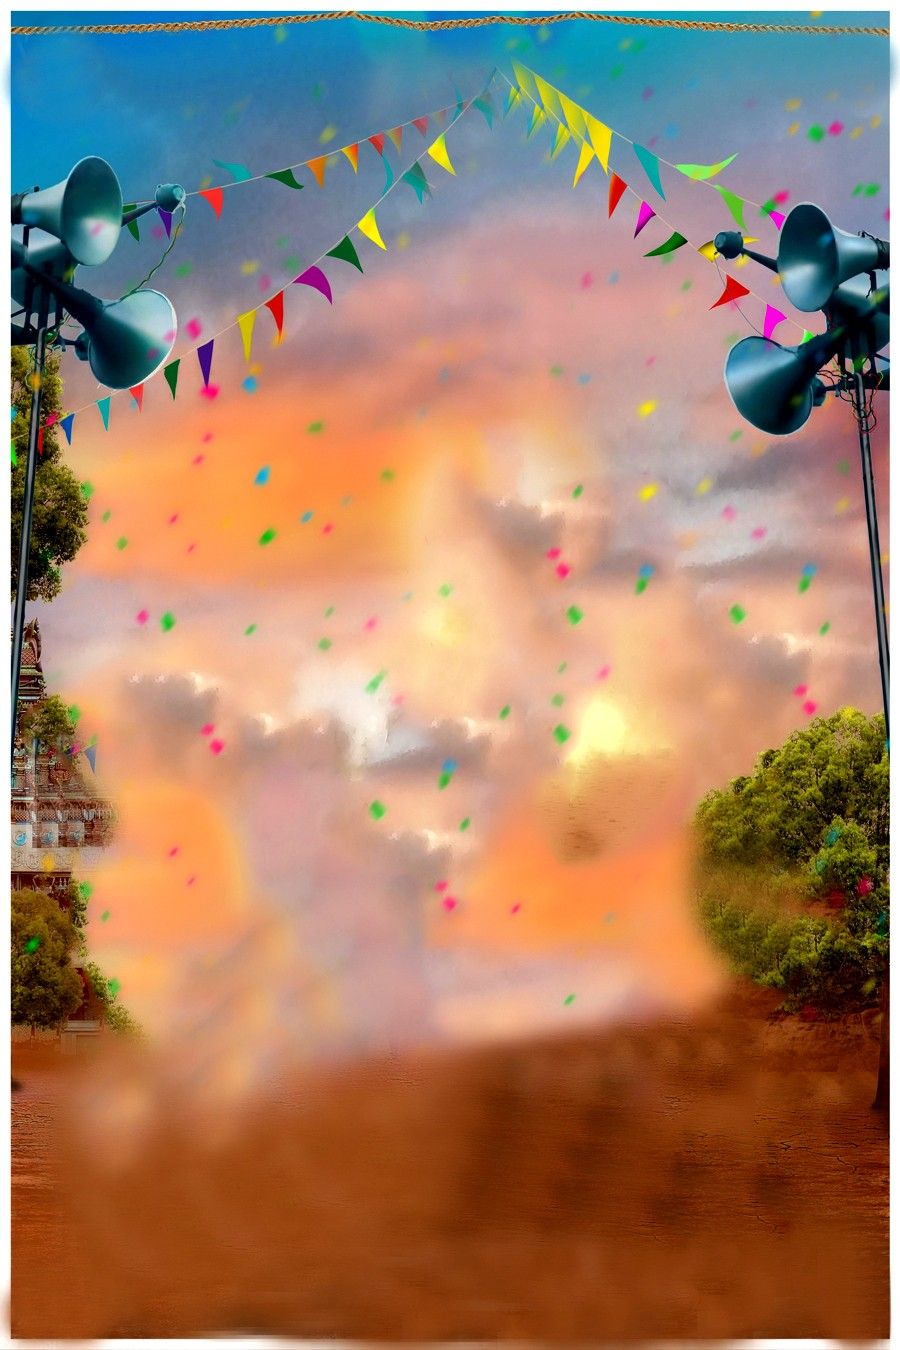 Pin On Blur Image Background